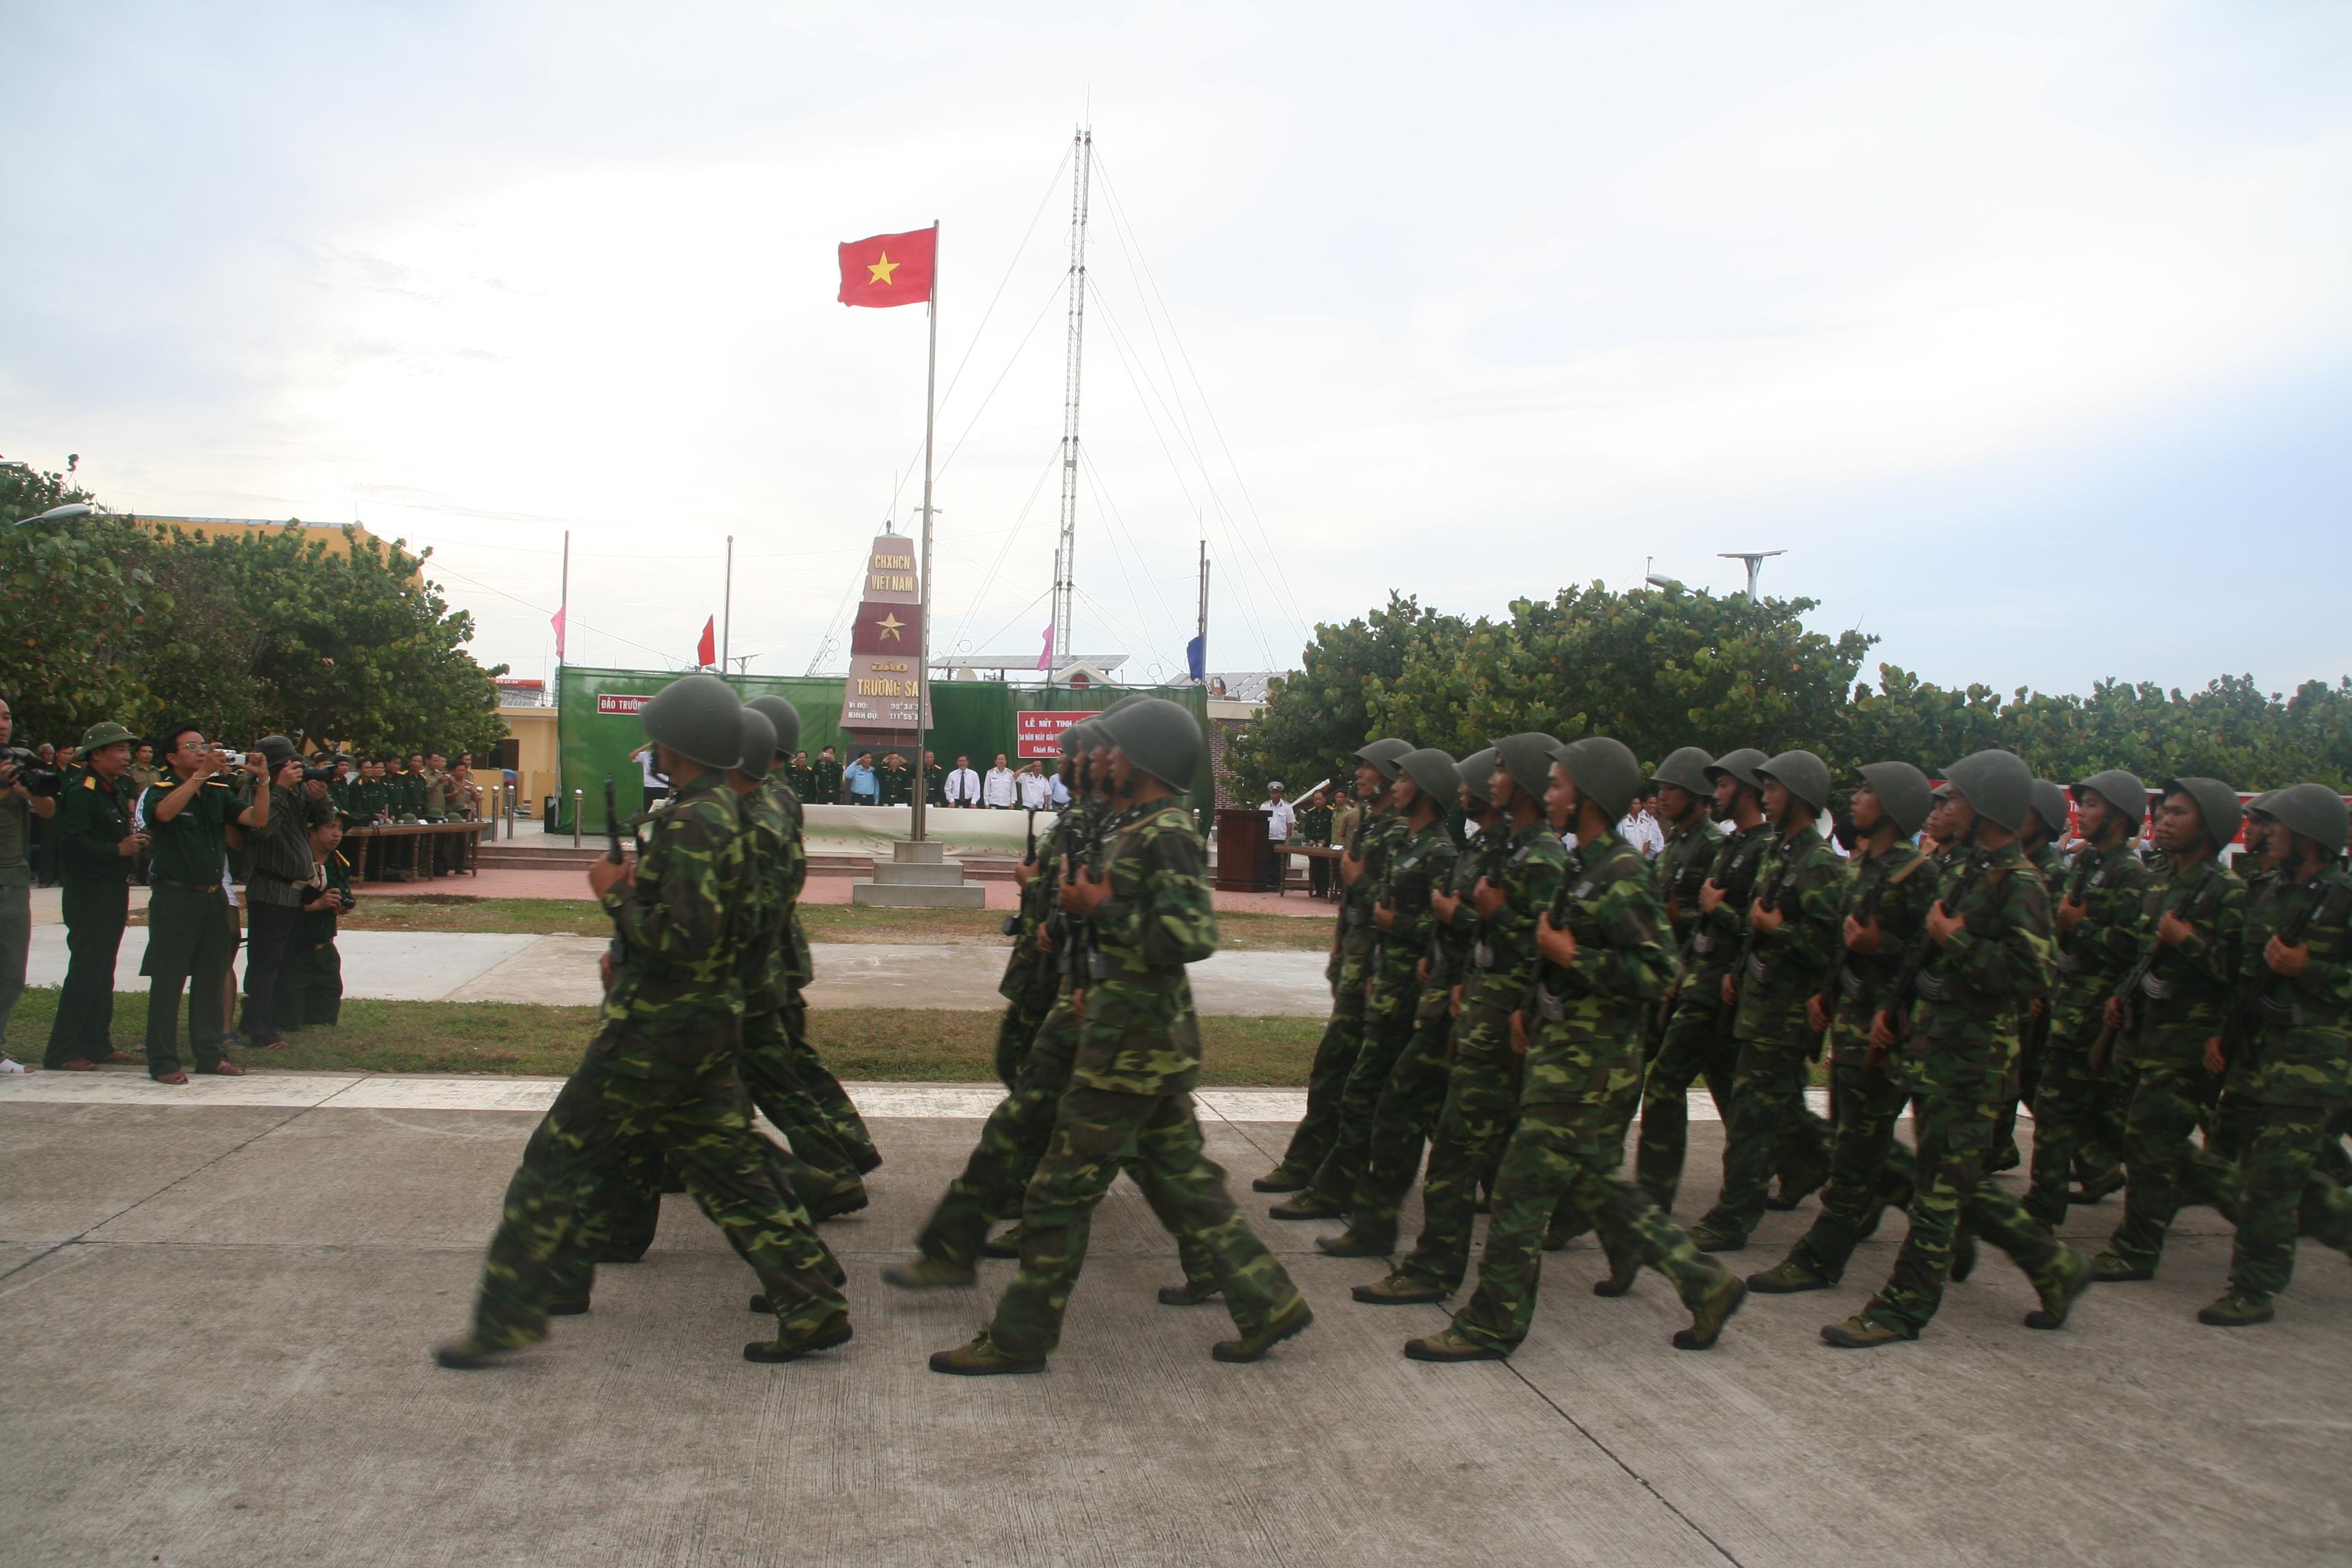 Vietnamese soldiers. Photo taken on March 31, 2009.